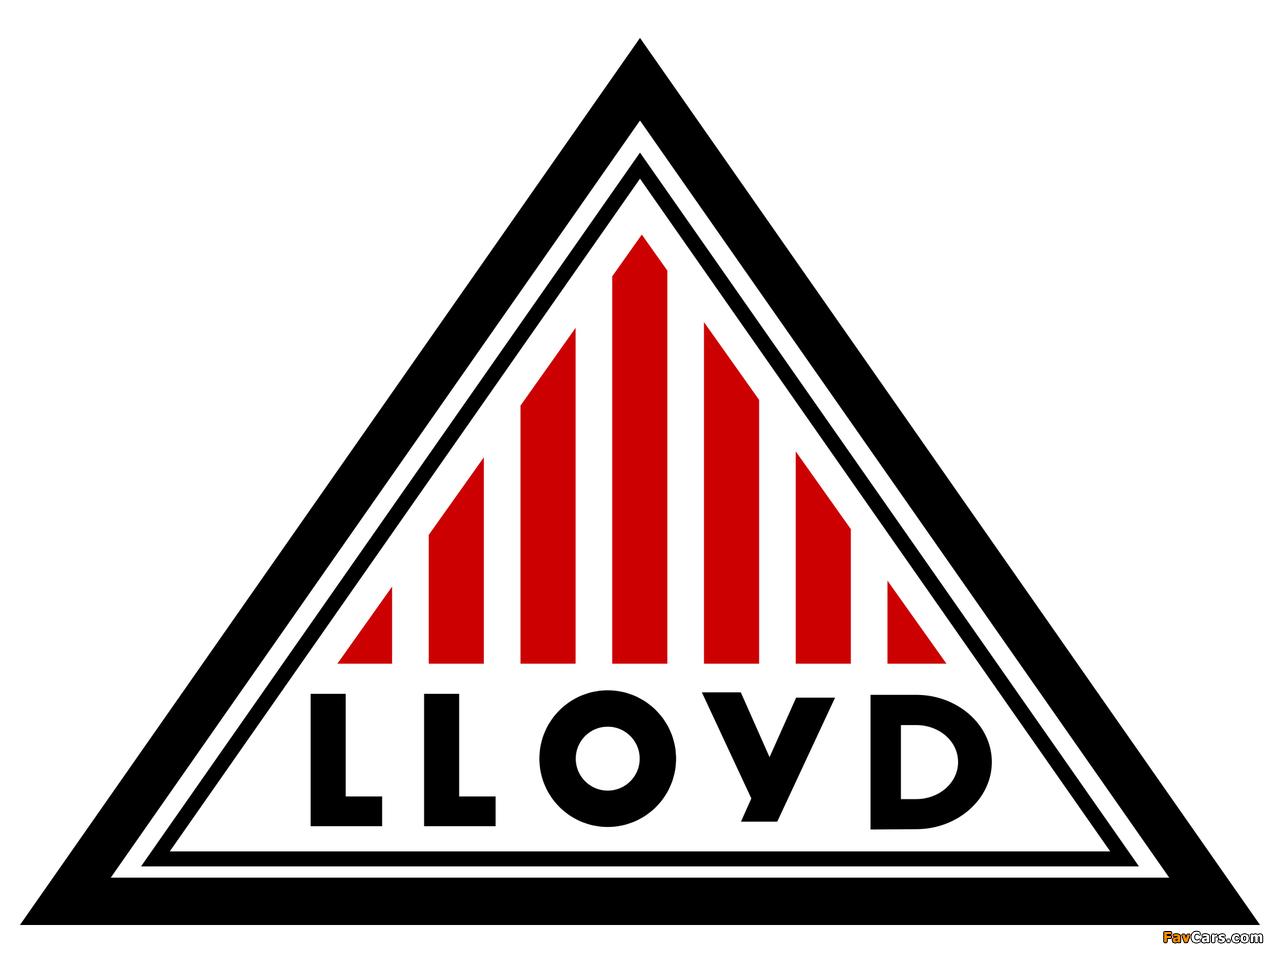 Lloyd wallpapers (1280 x 960)